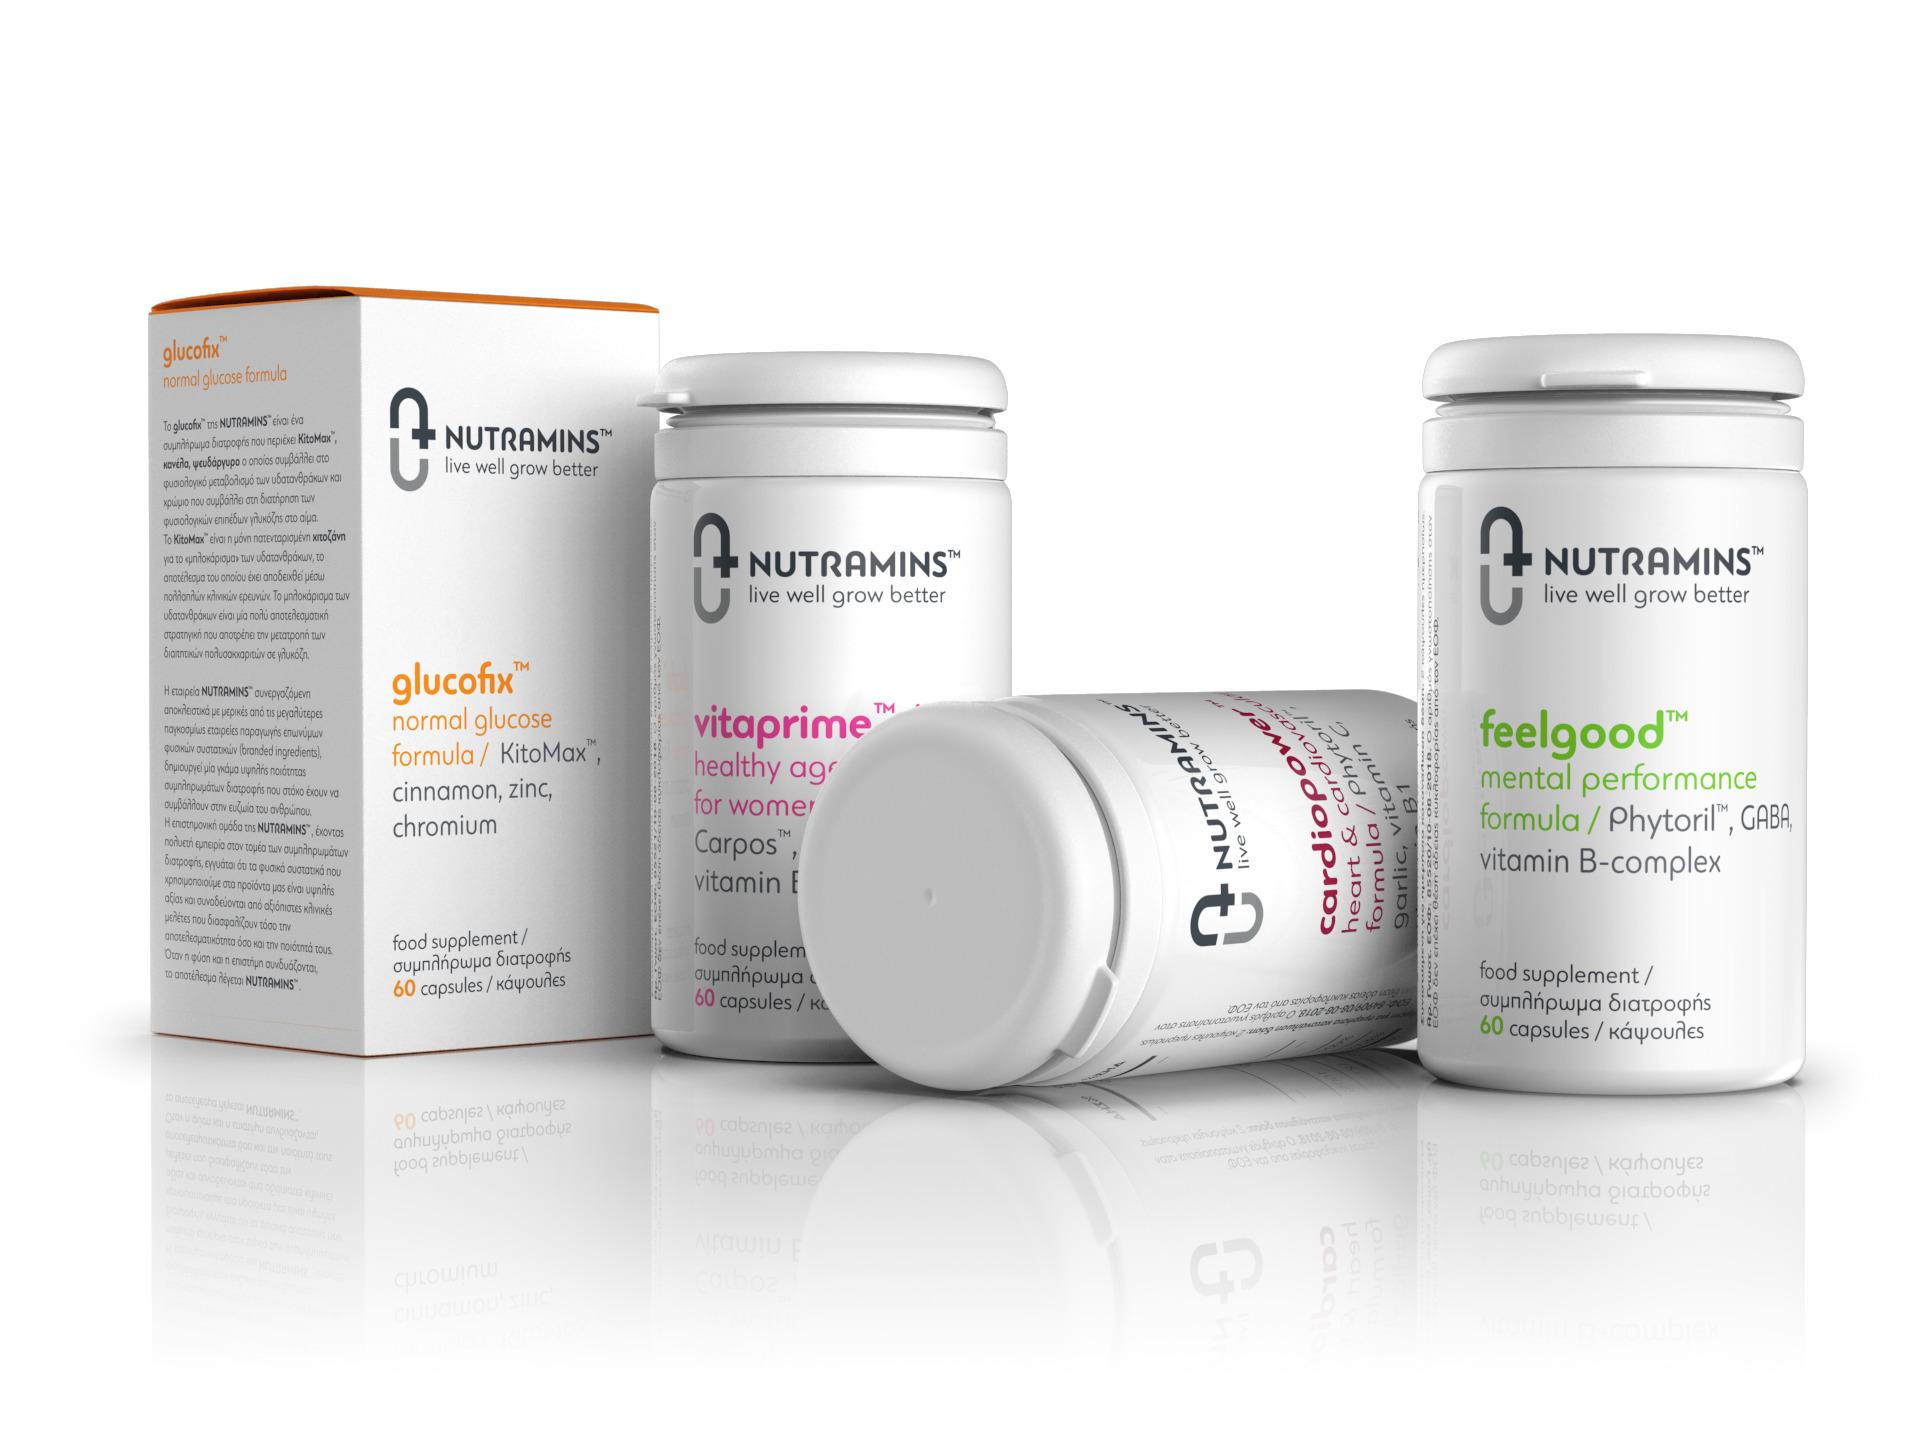 Nutramins™ Live Well Grow Better / World Brand Design Society